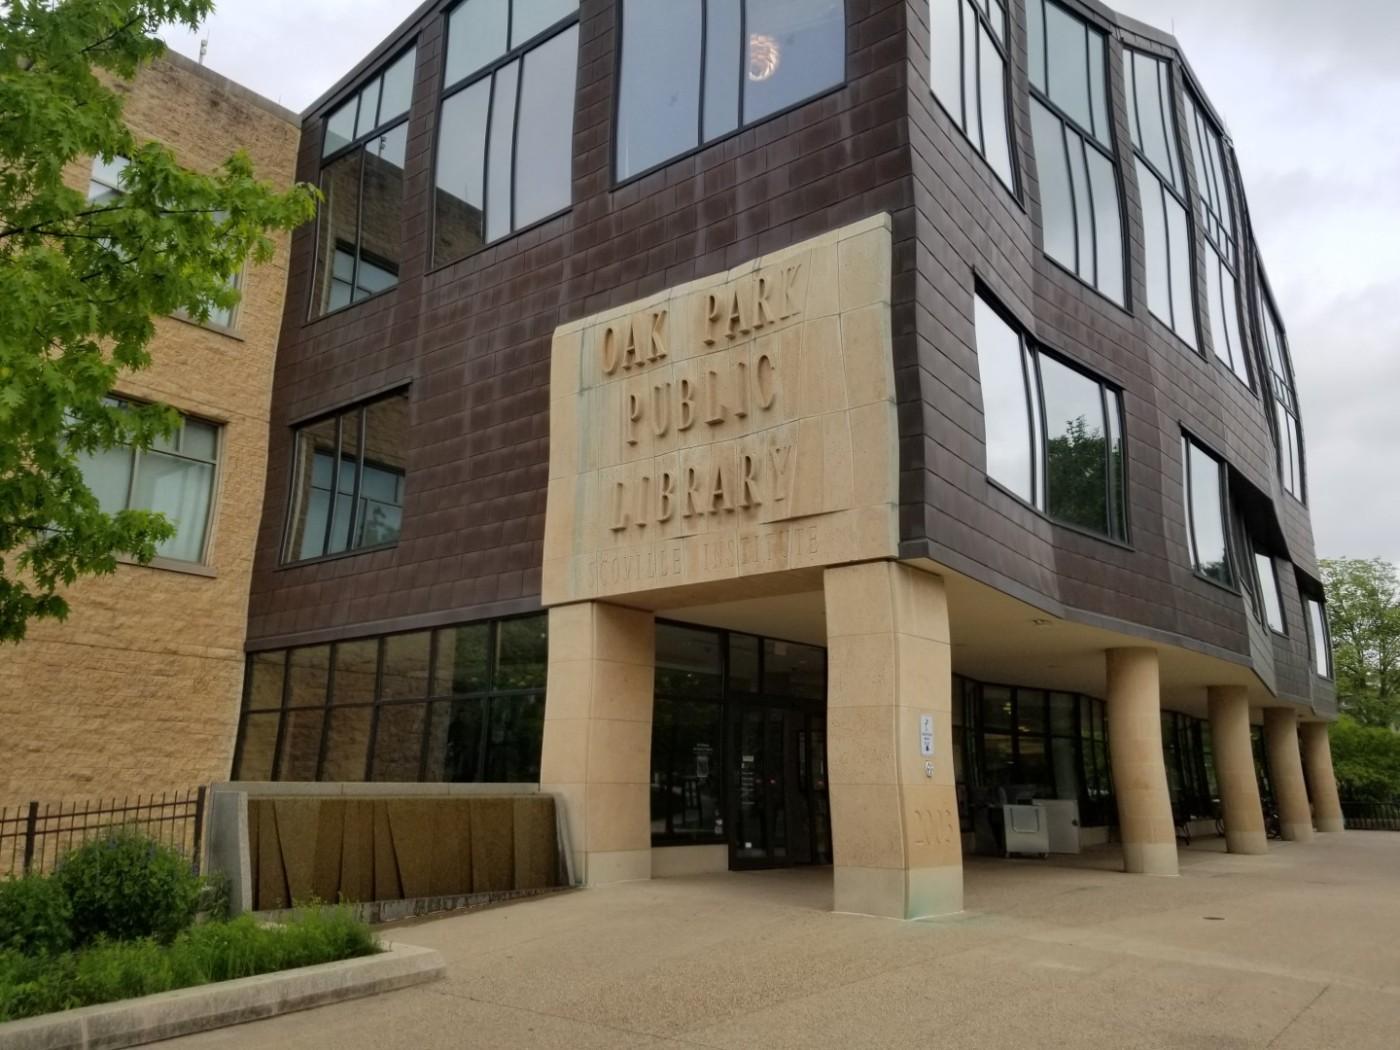 Oak Park Library Main Branch Entrance